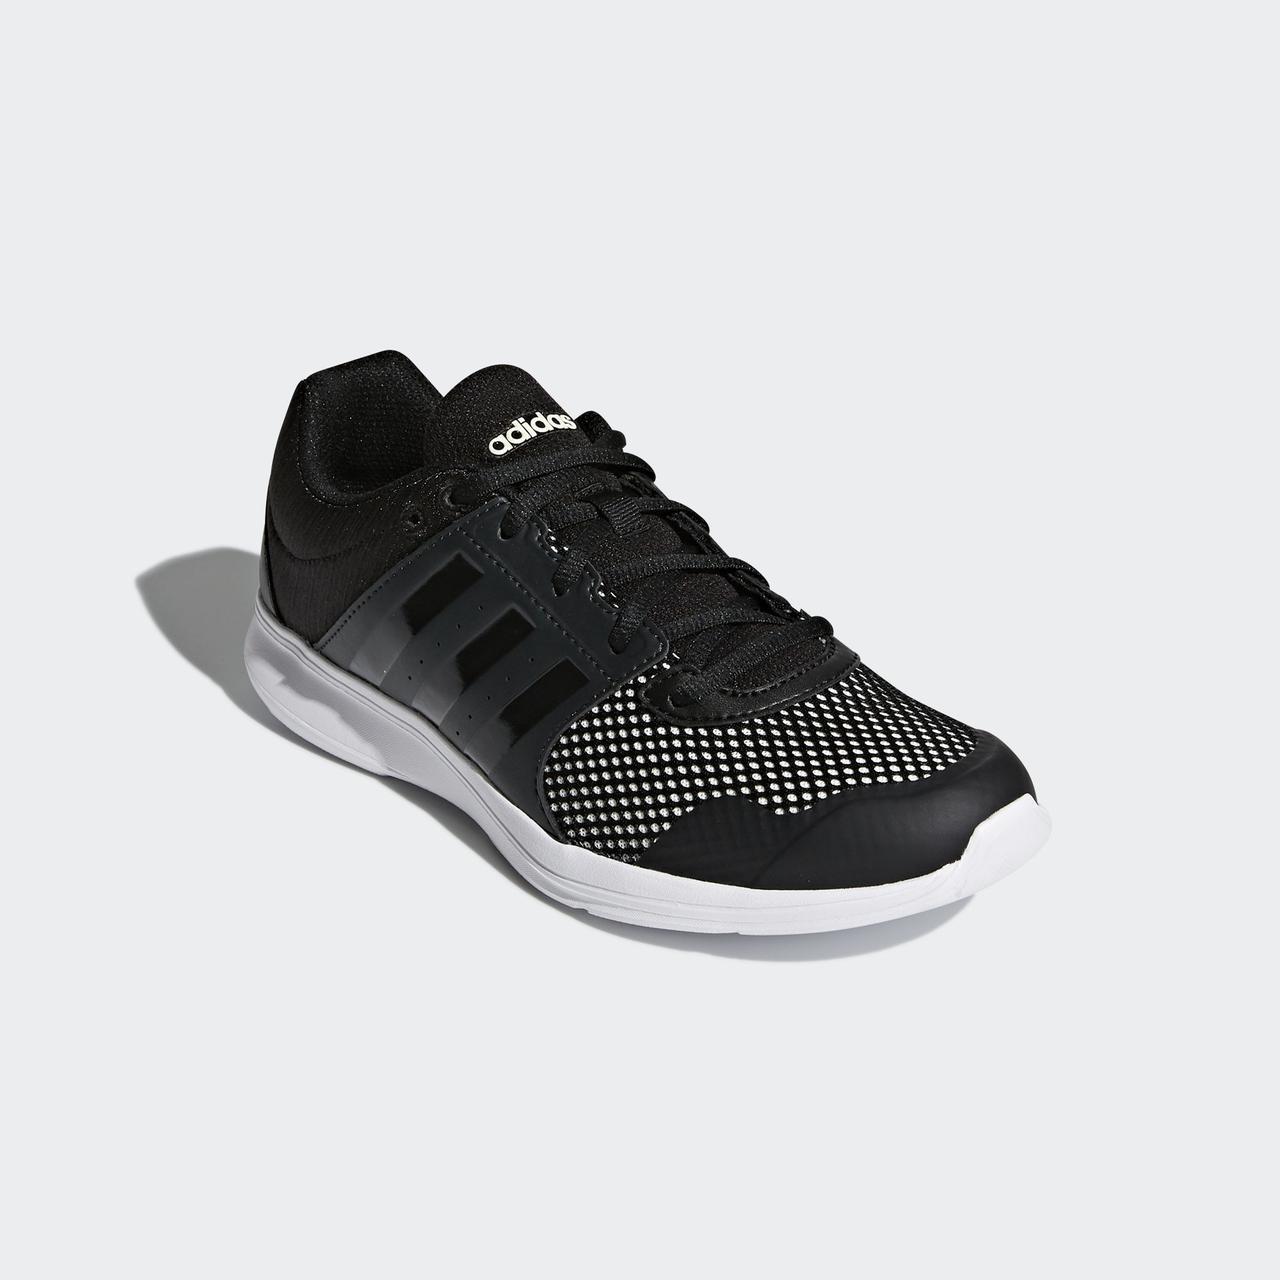 ... Женские кроссовки Adidas Performance Essential Fun 2.0 (Артикул   CP8951), ... e021ddd7a1b